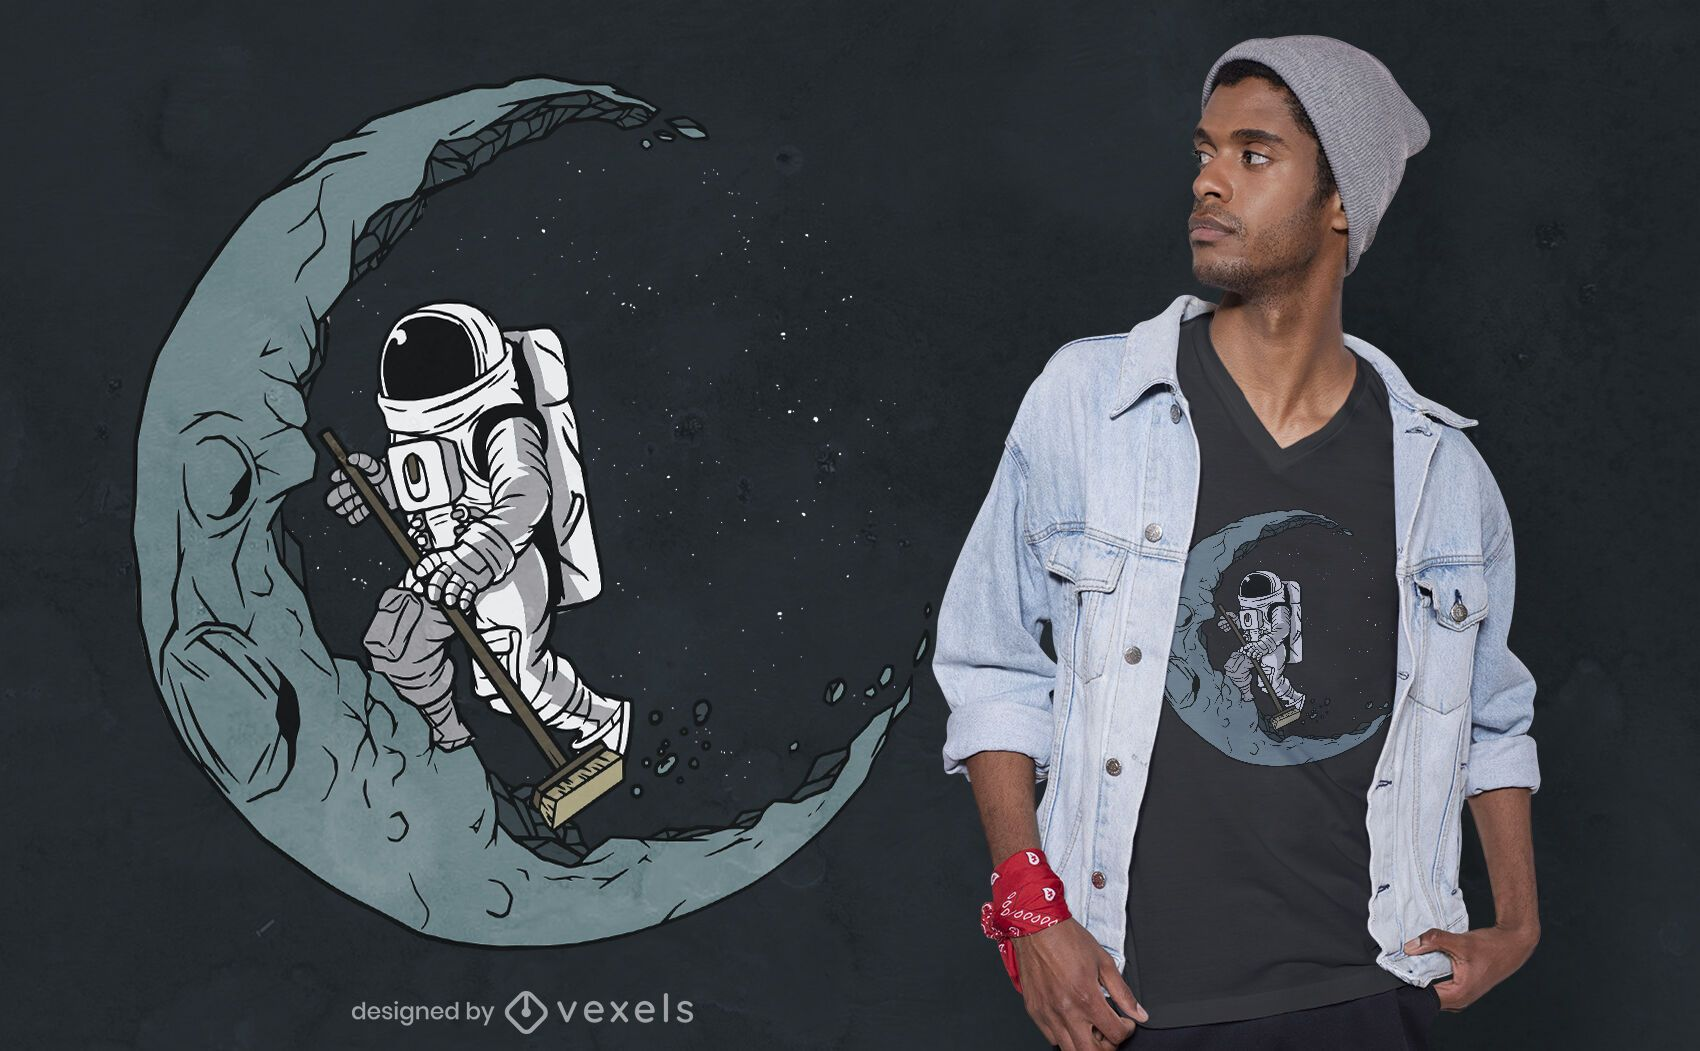 Sweeping astronaut t-shirt design